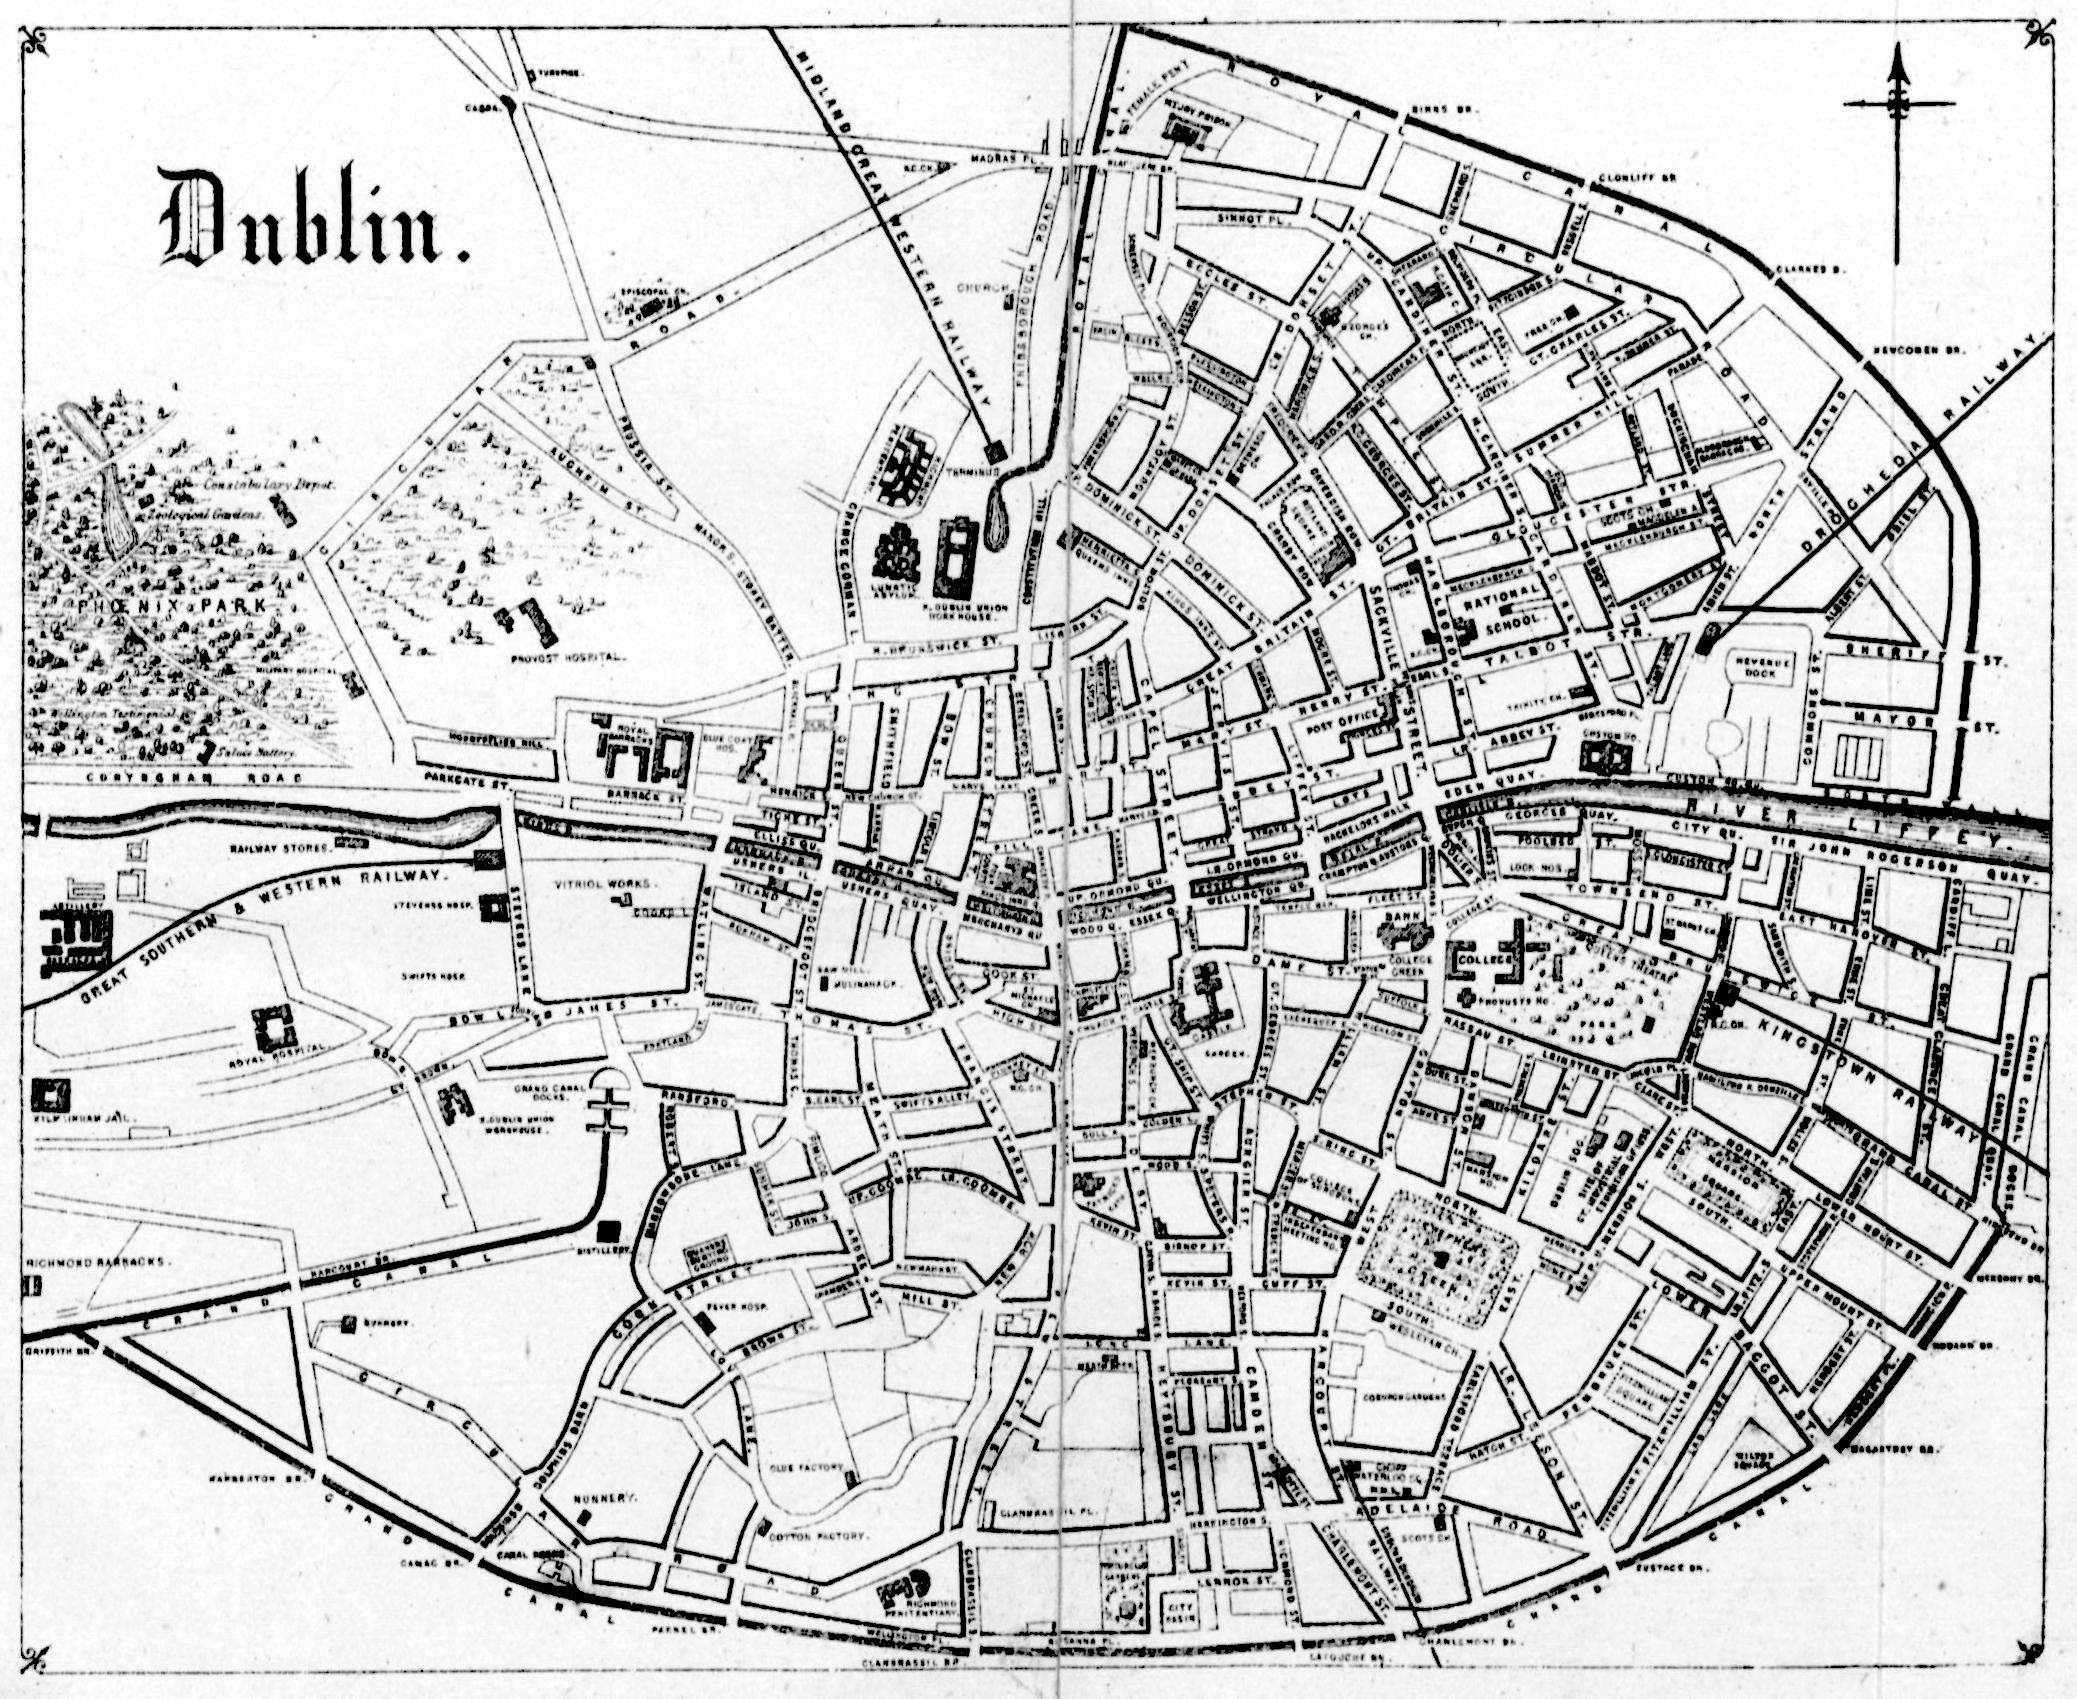 2077x1699 Filesullivan(1888) P039 Map Of The City Of Dublin.jpg